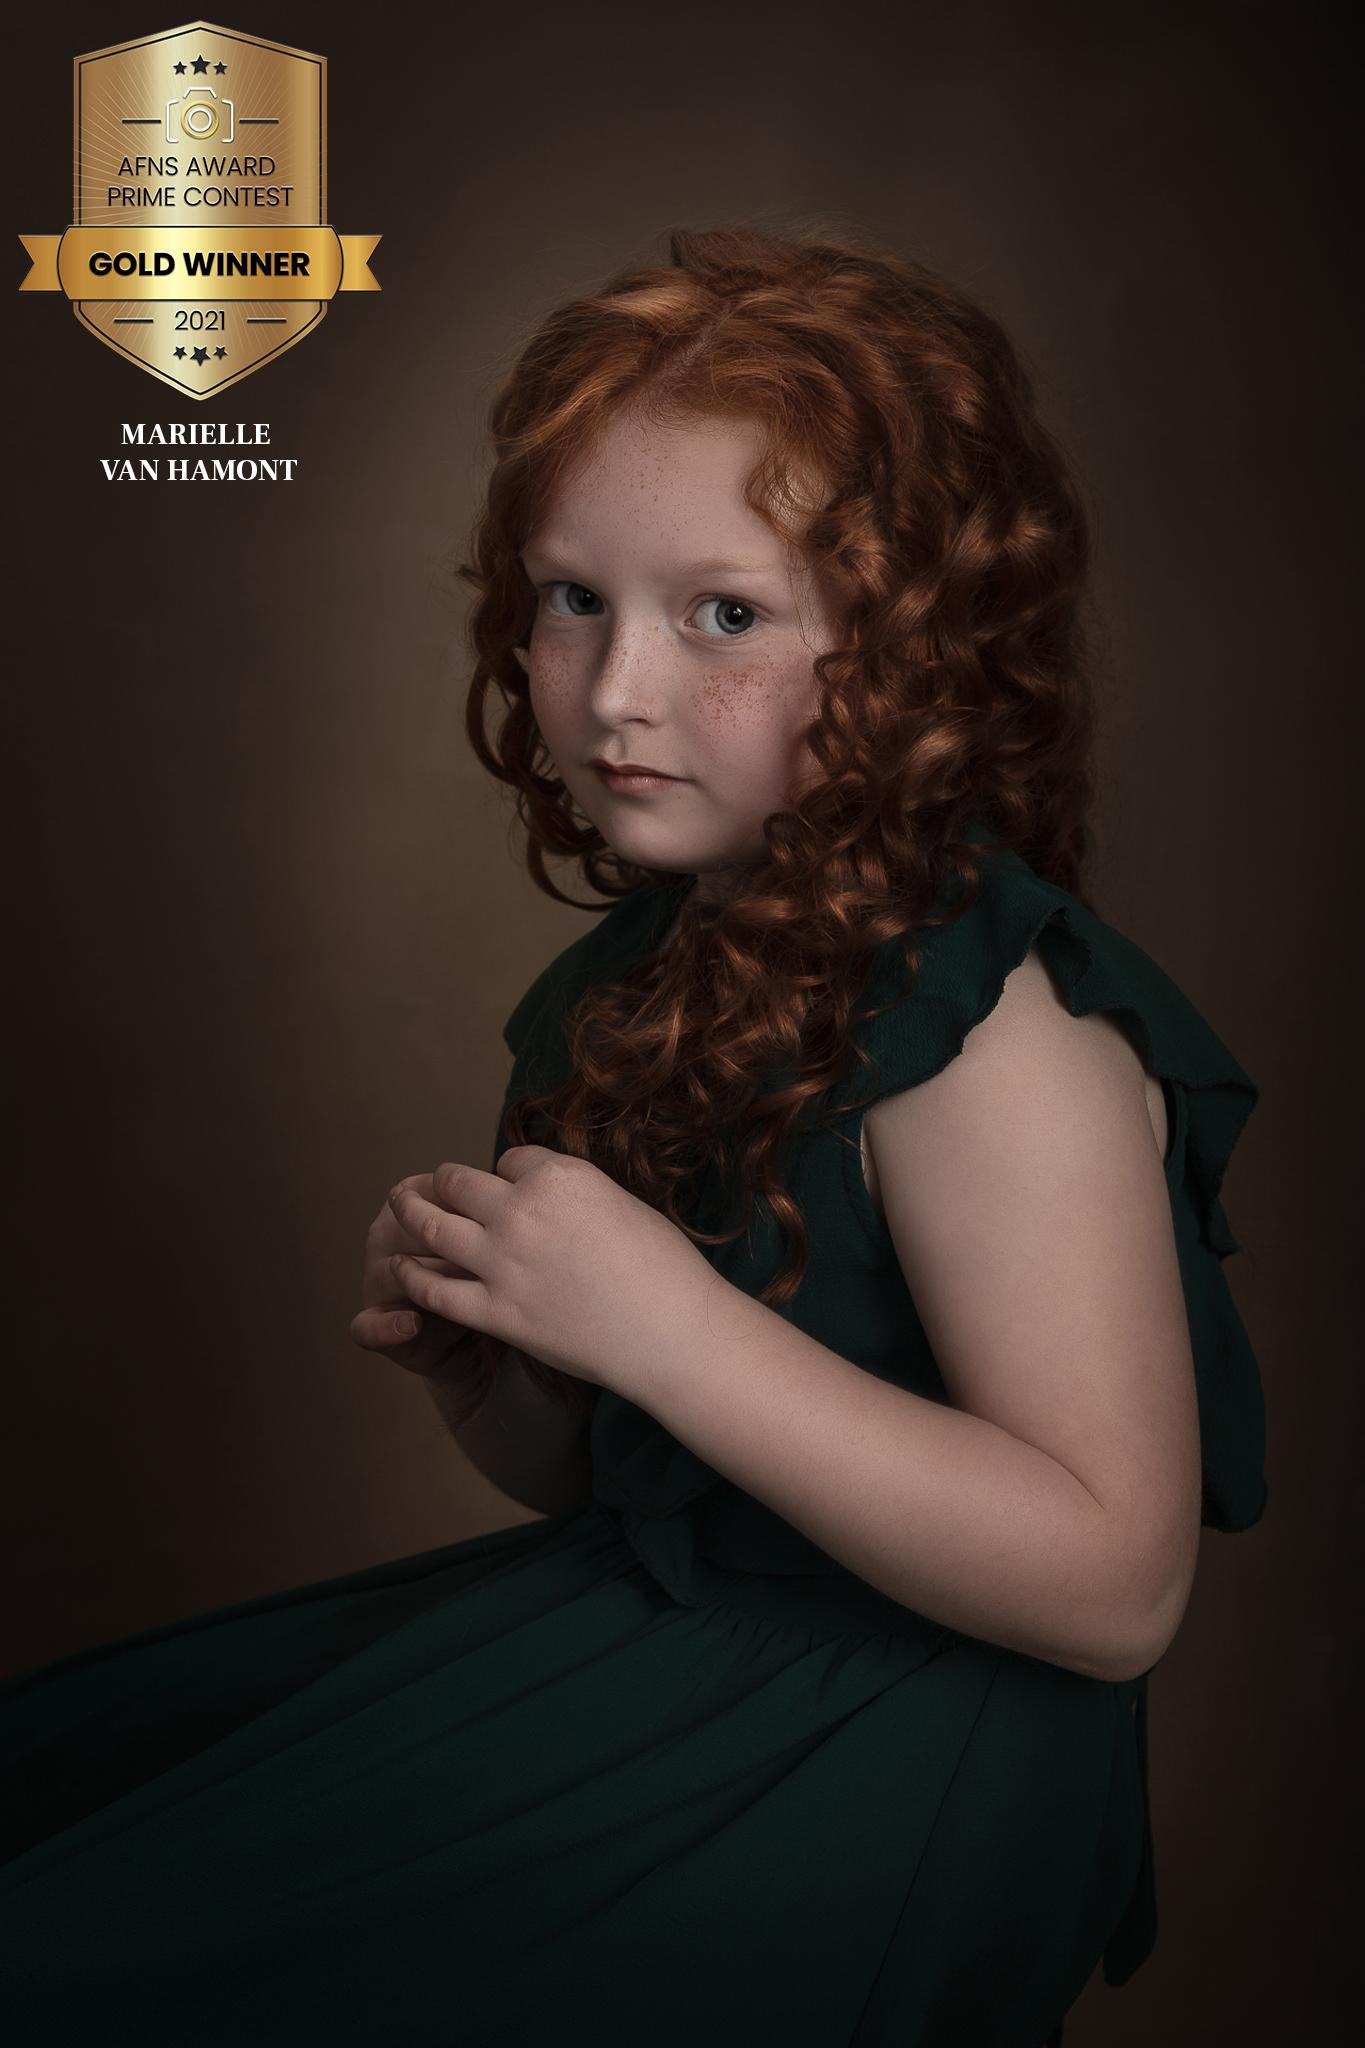 afns primecontest, award winnende foto, fine-art fotografie